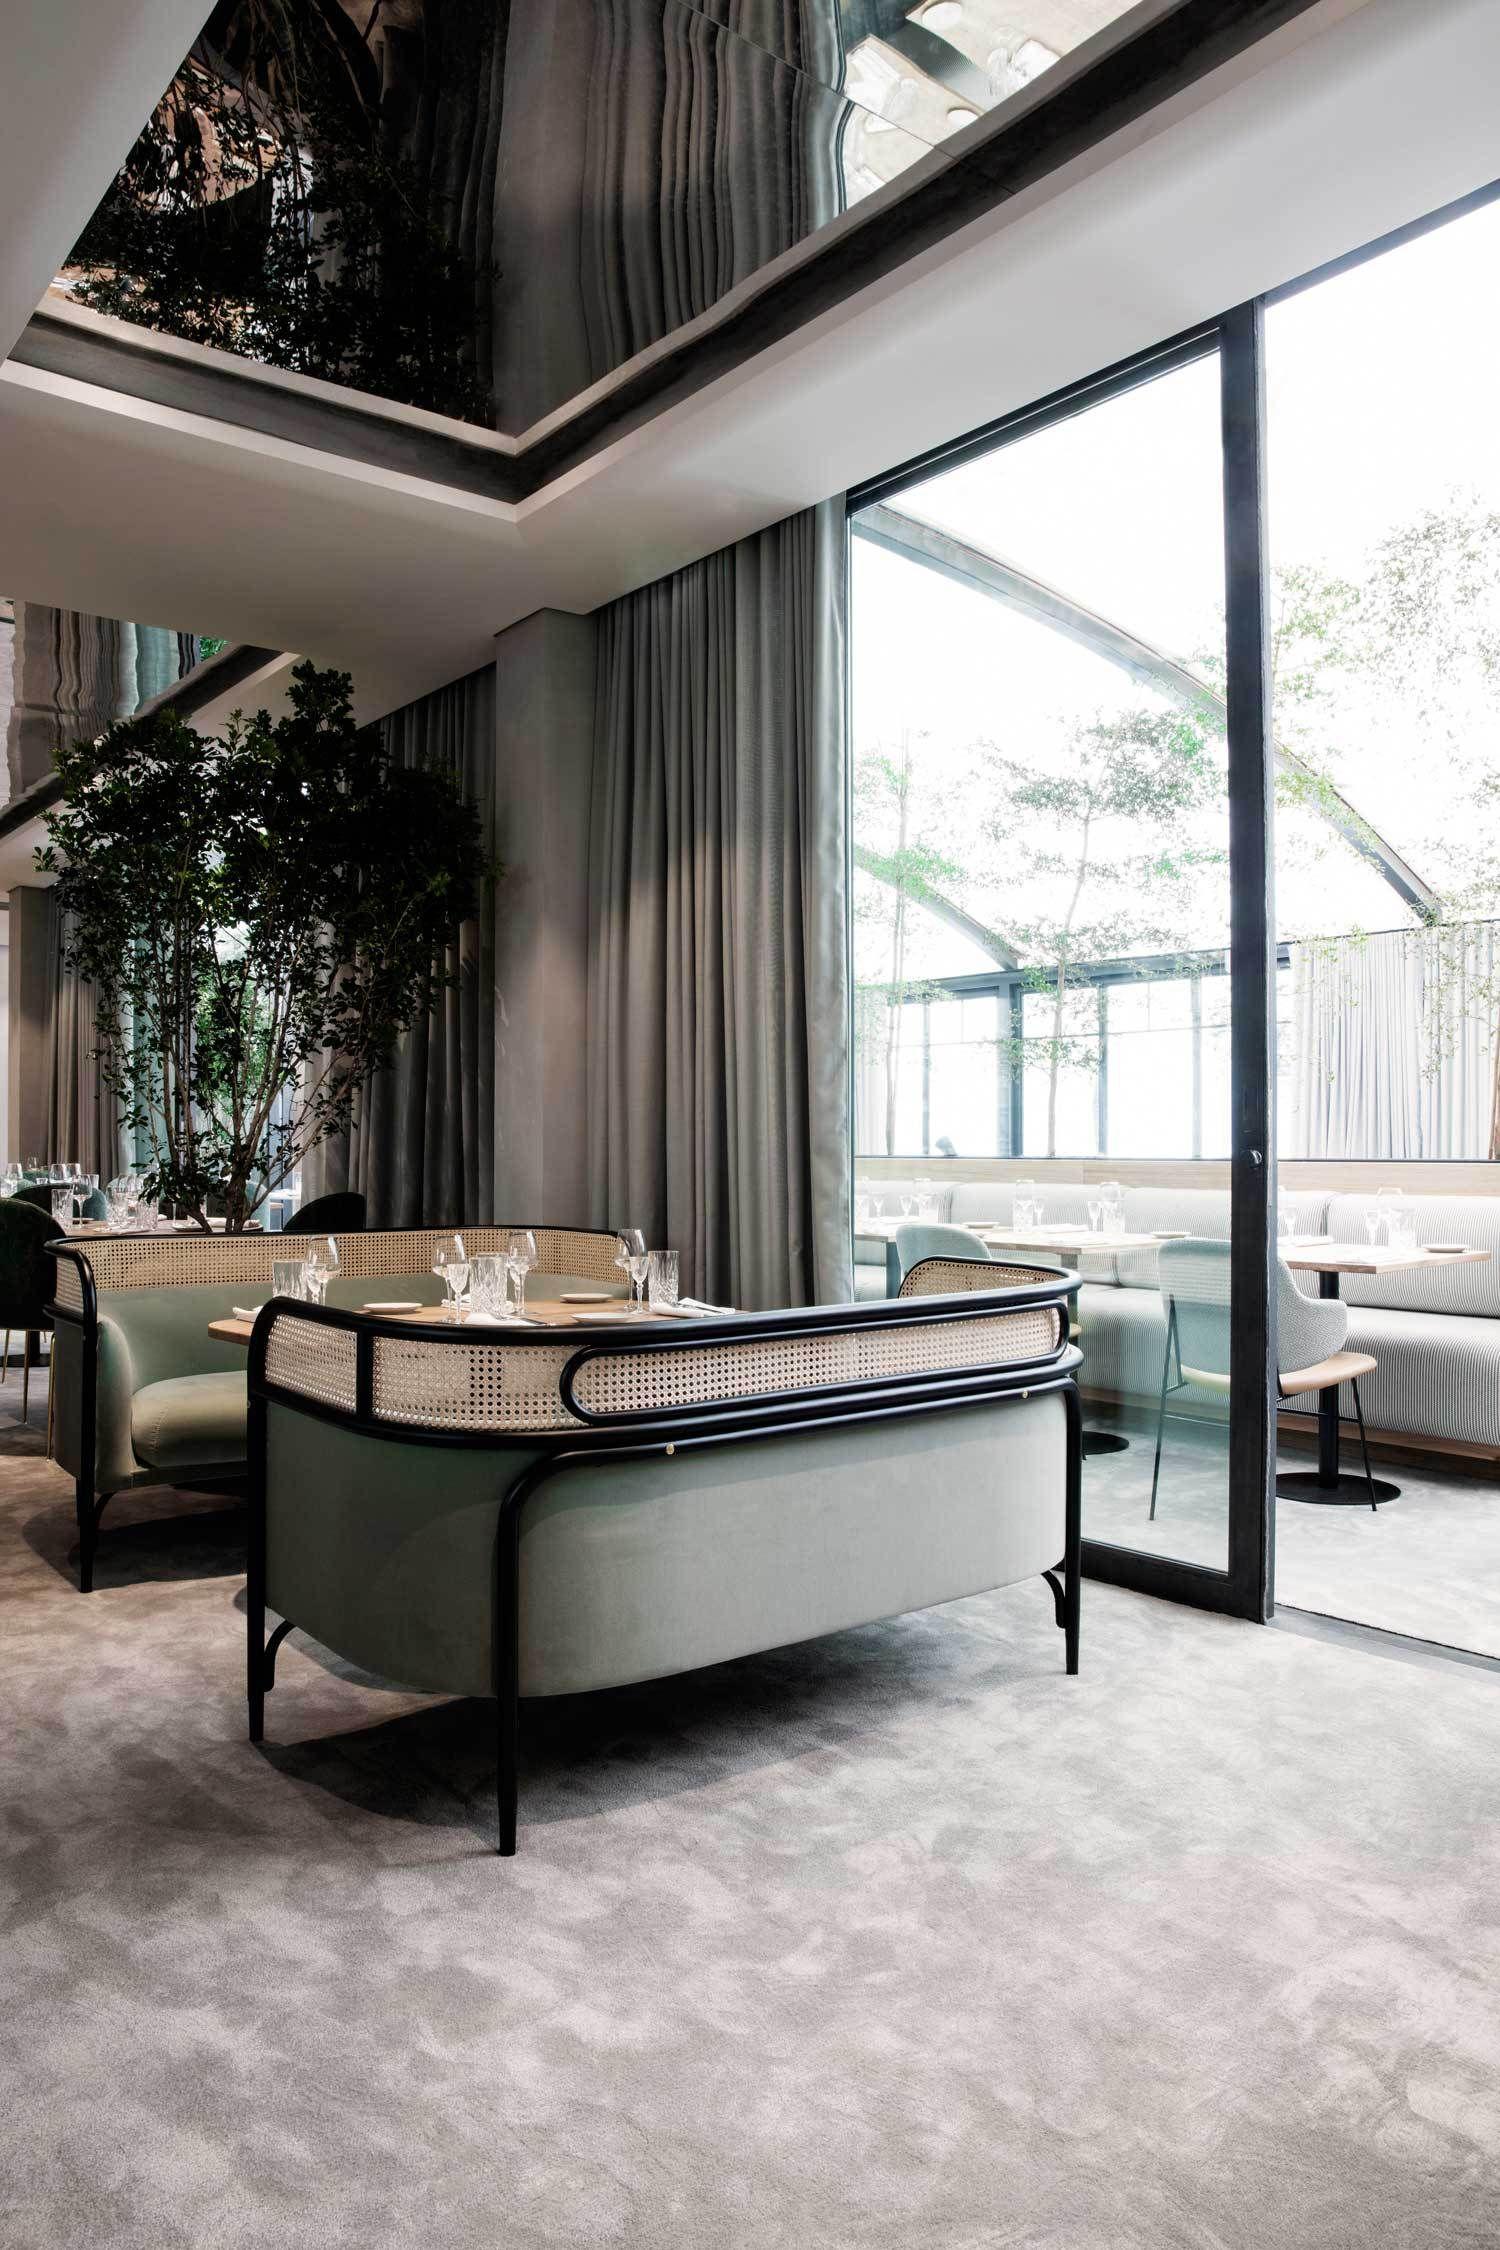 maison du danemark house of denmark in paris by. Black Bedroom Furniture Sets. Home Design Ideas